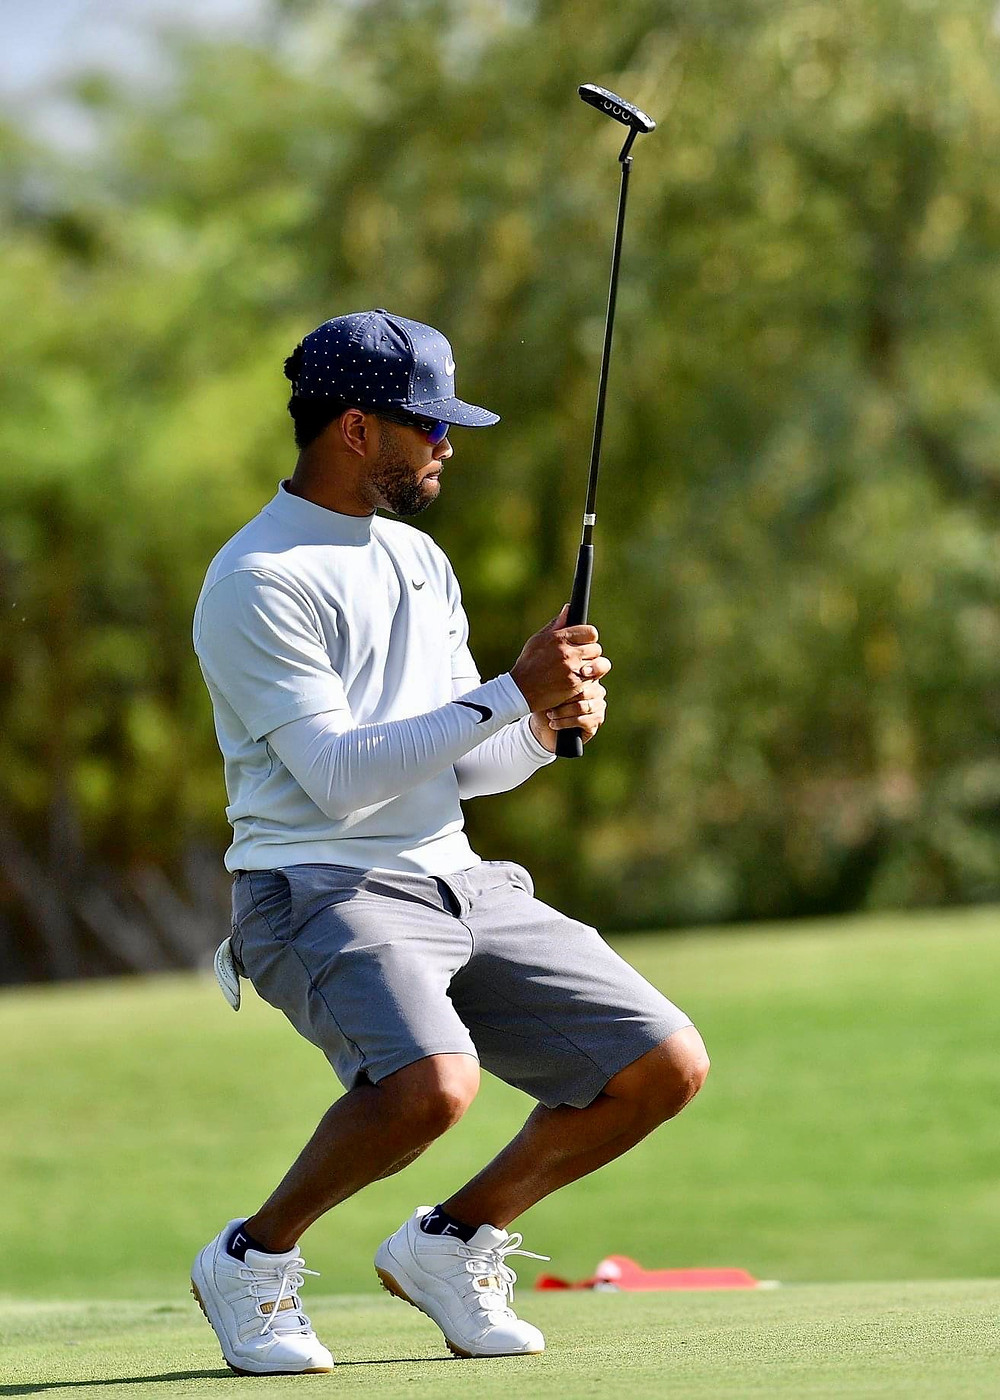 Doug Smith in round two of the 2020 Arizona State Open. Photo Credit: Southwest PGA